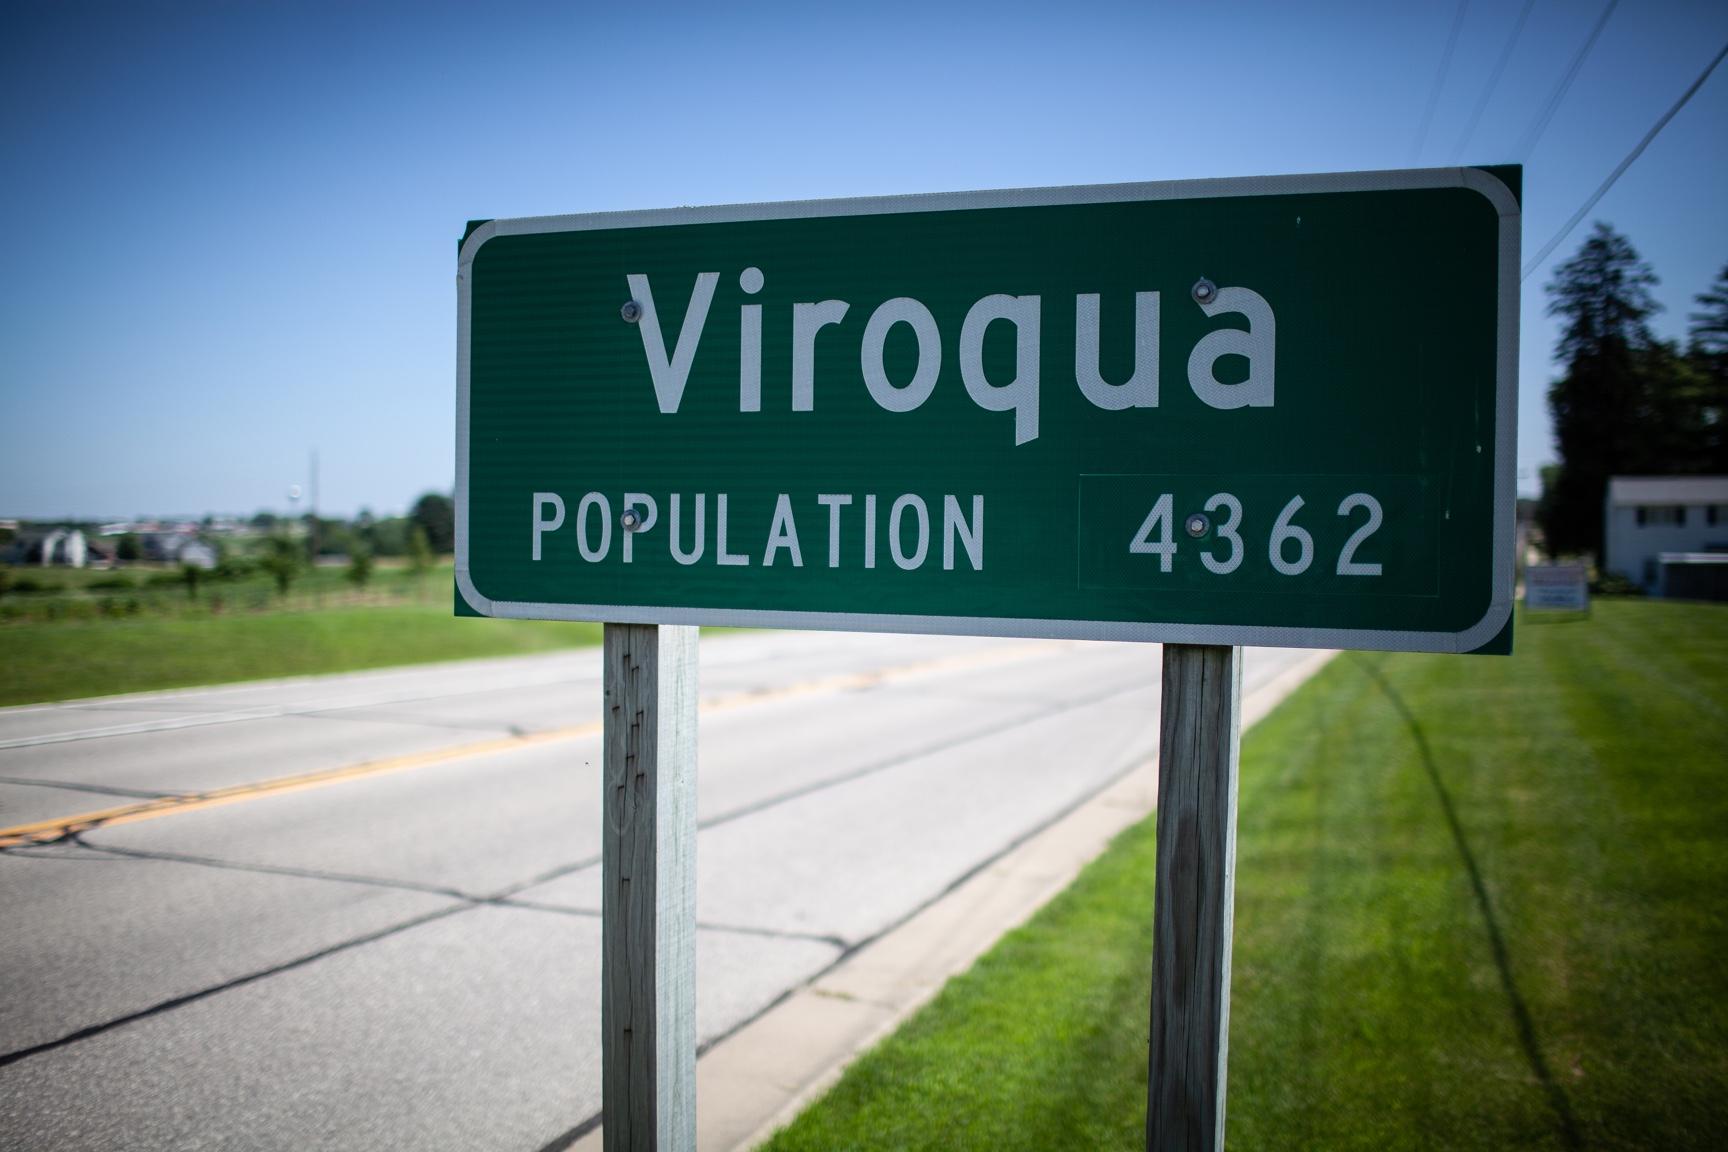 Road sign that says Viroqua, Wisconsin, population 4,362.